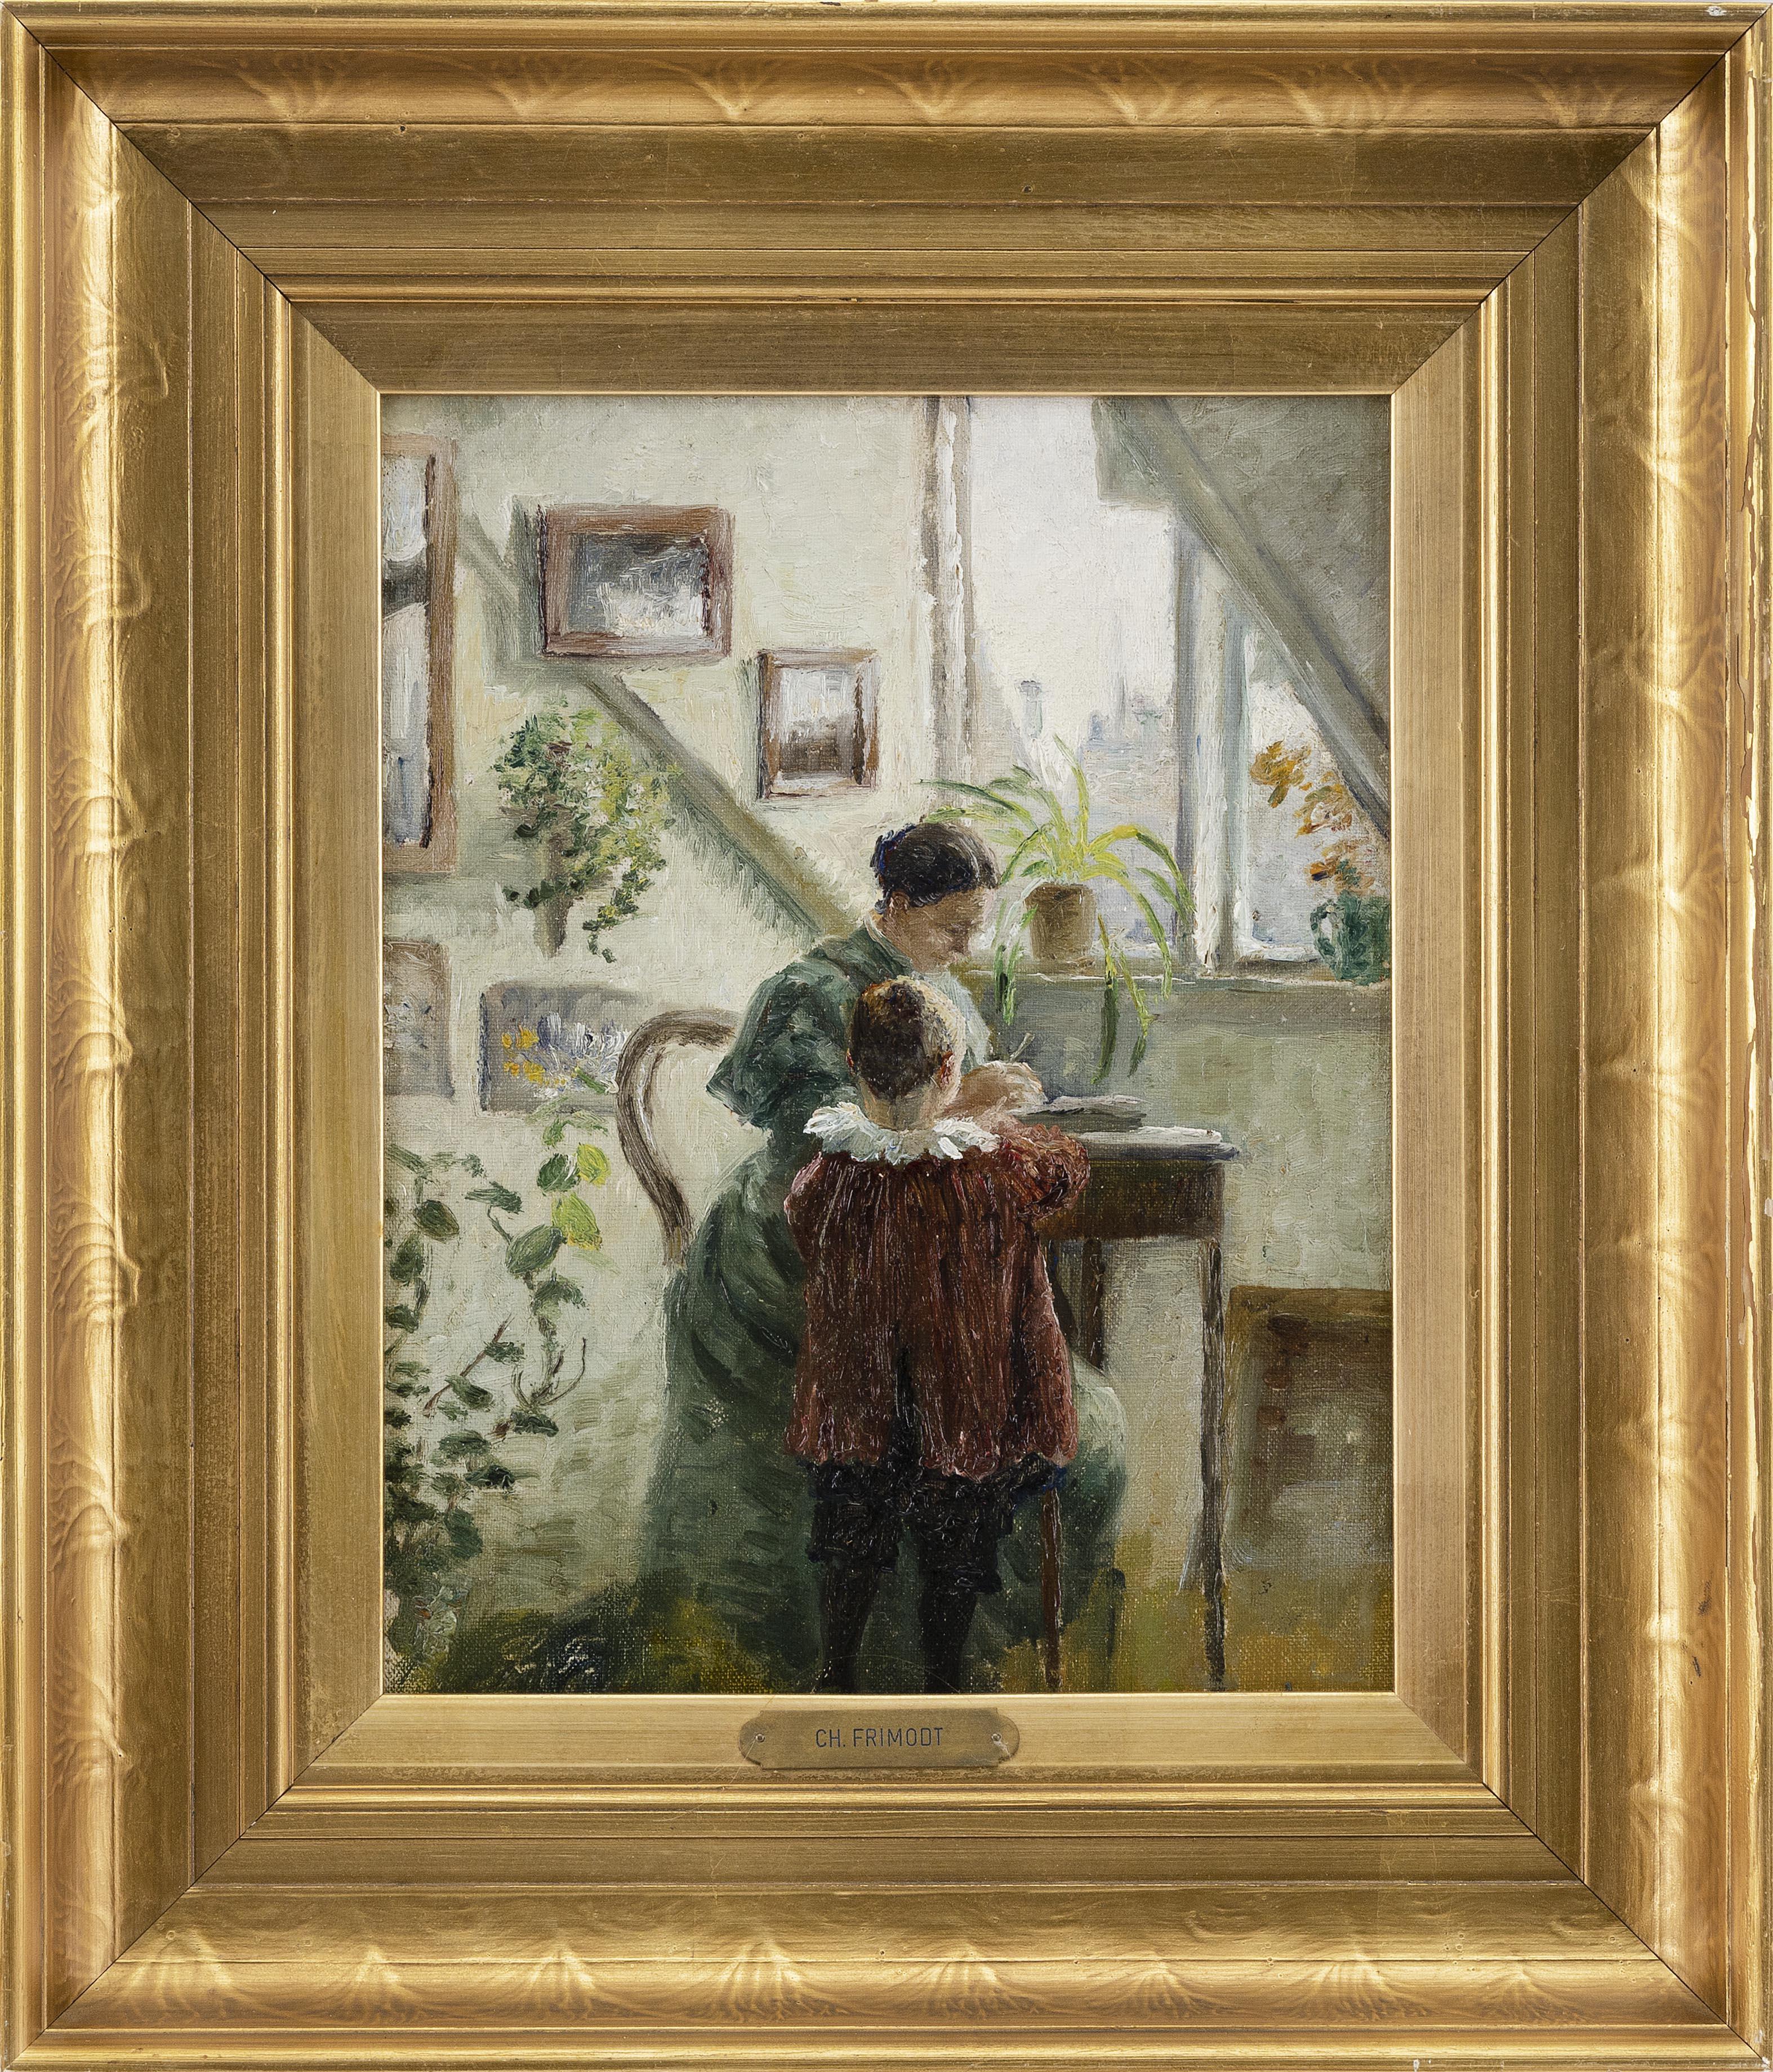 "CHARLOTTE FRIMODT (Denmark, 1862-1950), Interior scene with mother & child, Oil on canvas-board 11.75"" x 9"". Framed 17"" x 14.5""."